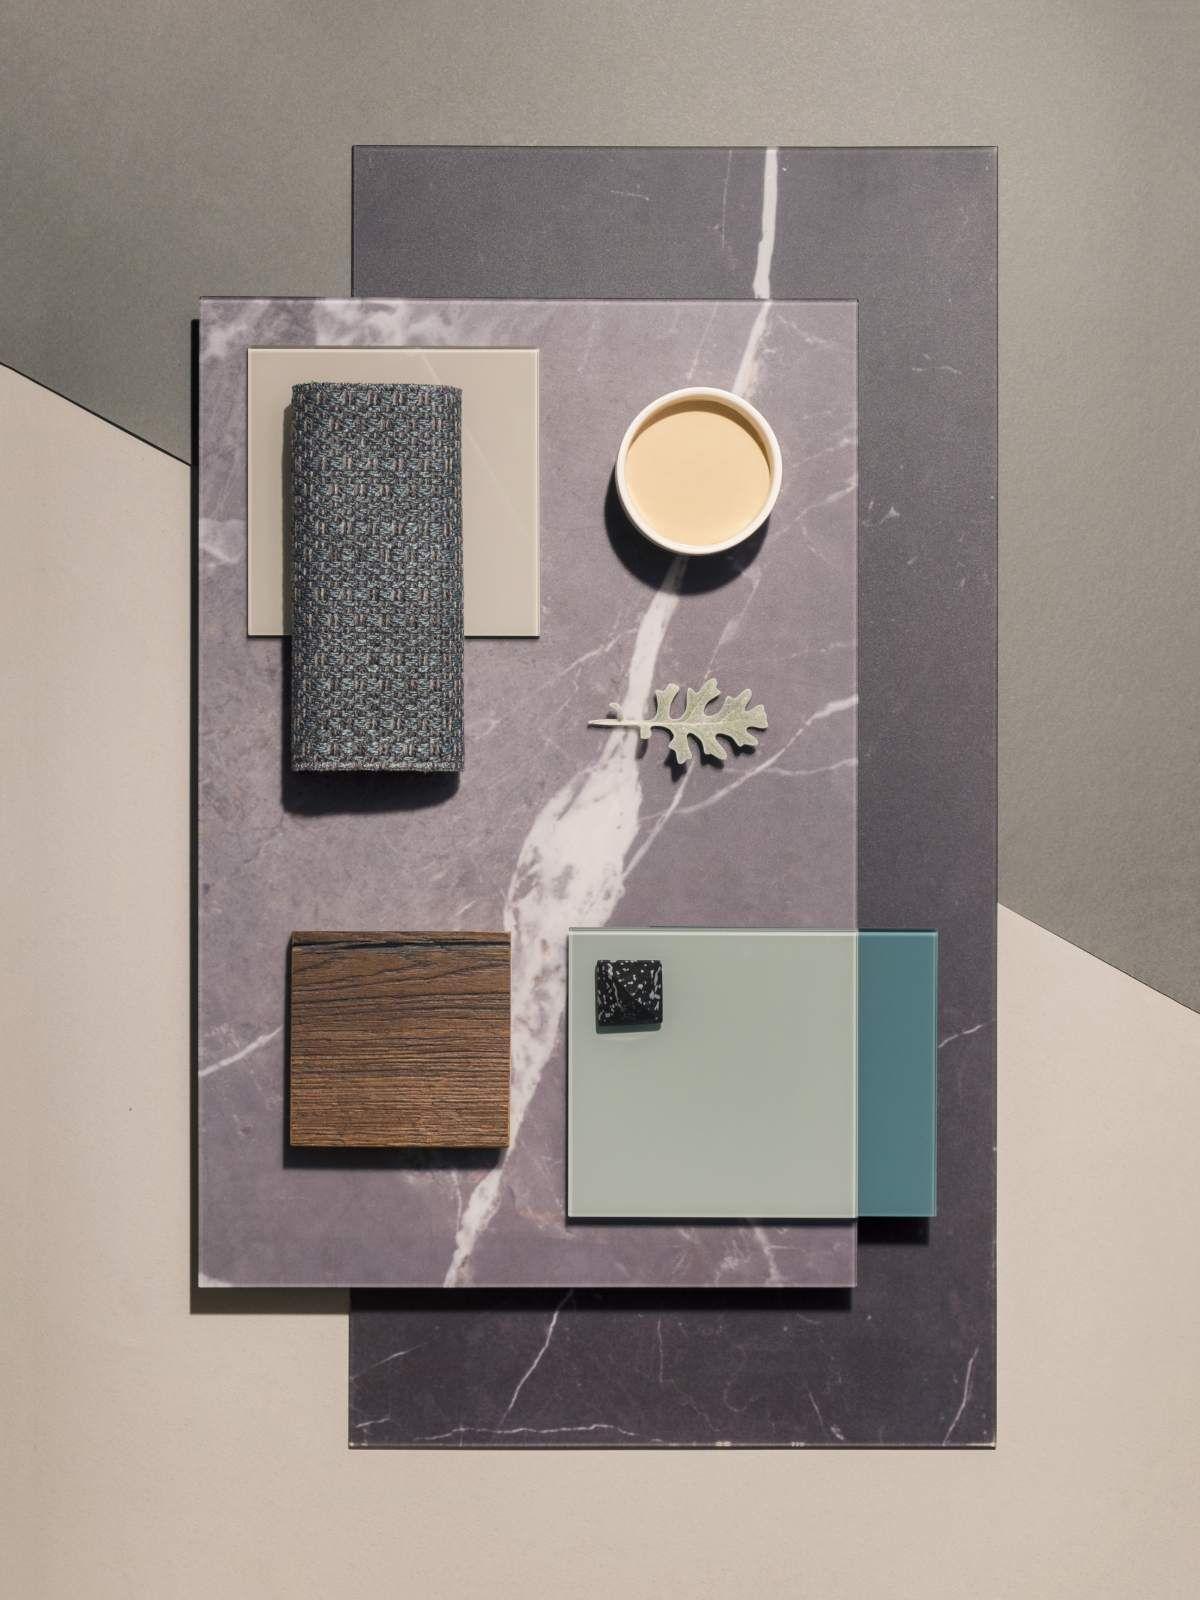 Luxury Design And Craftsmanship Summit 2019 Live Showcases Interior Design Mood Board Materials Board Interior Design Mood Board Design